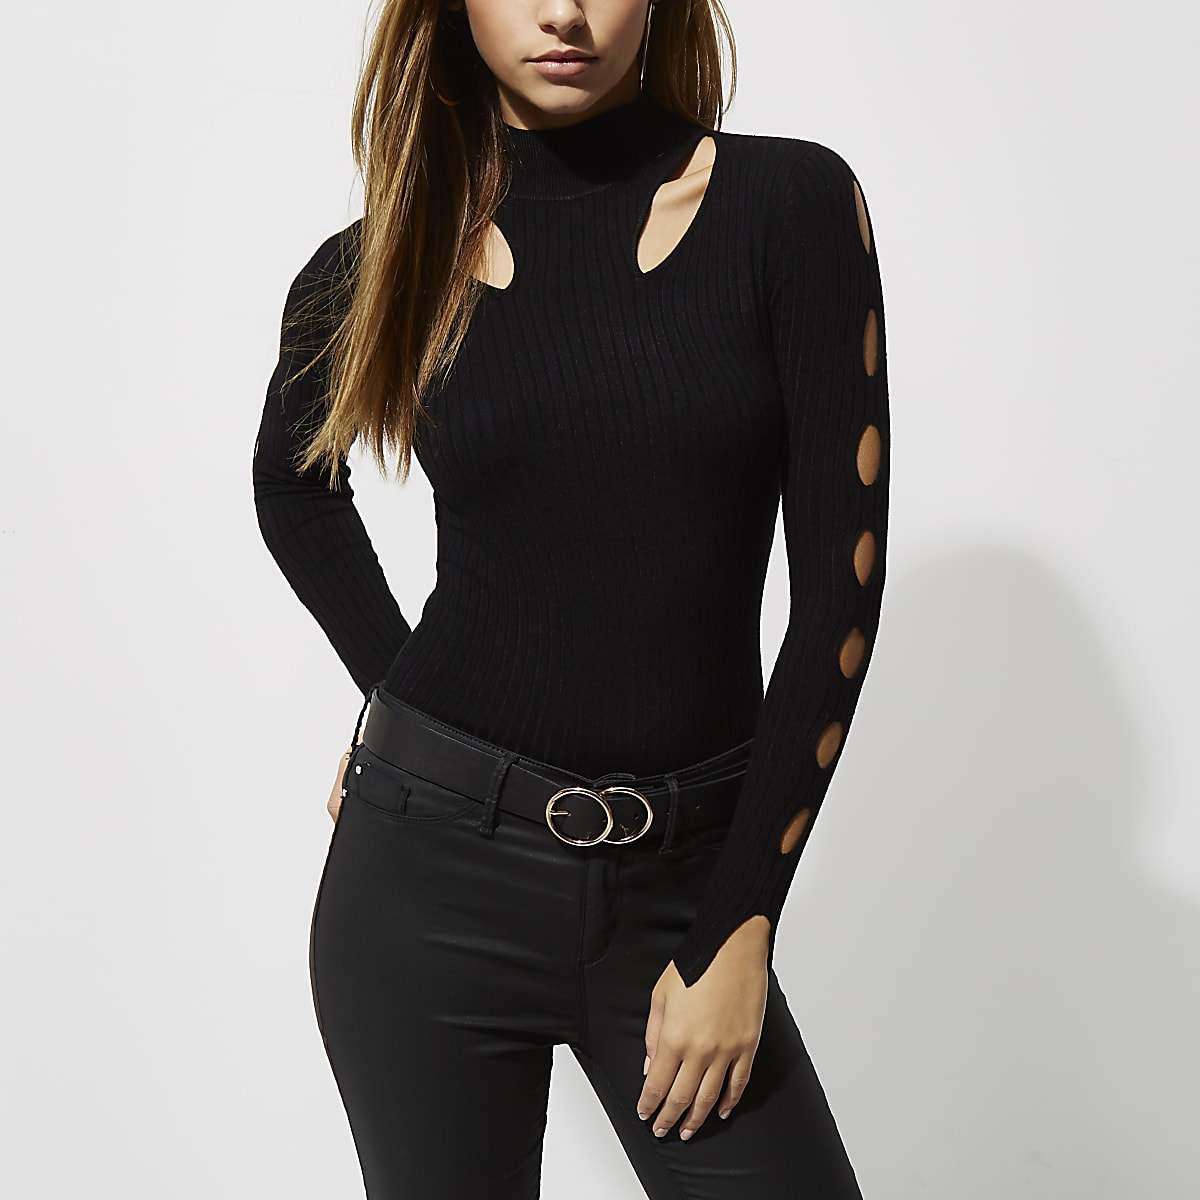 2866e889b6668 Black rib knit cut out high neck top - Knit Tops - Knitwear - women